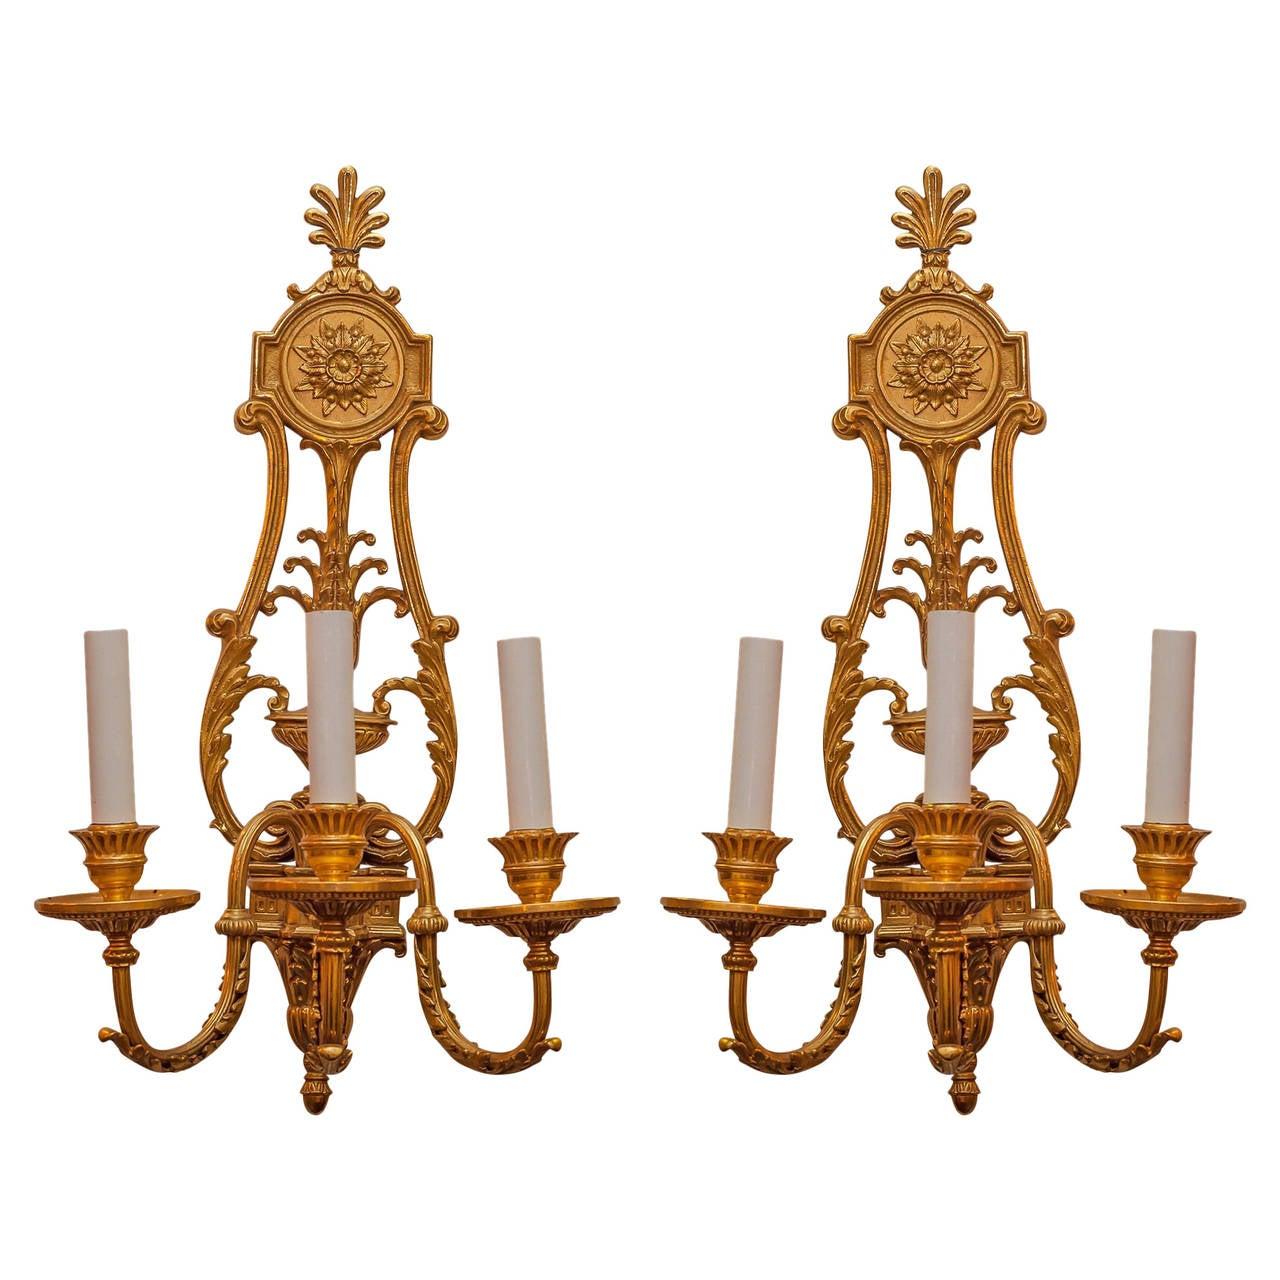 Pair of Gilt Bronze Louis XVI Style Three-Arm Wall Light Sconces